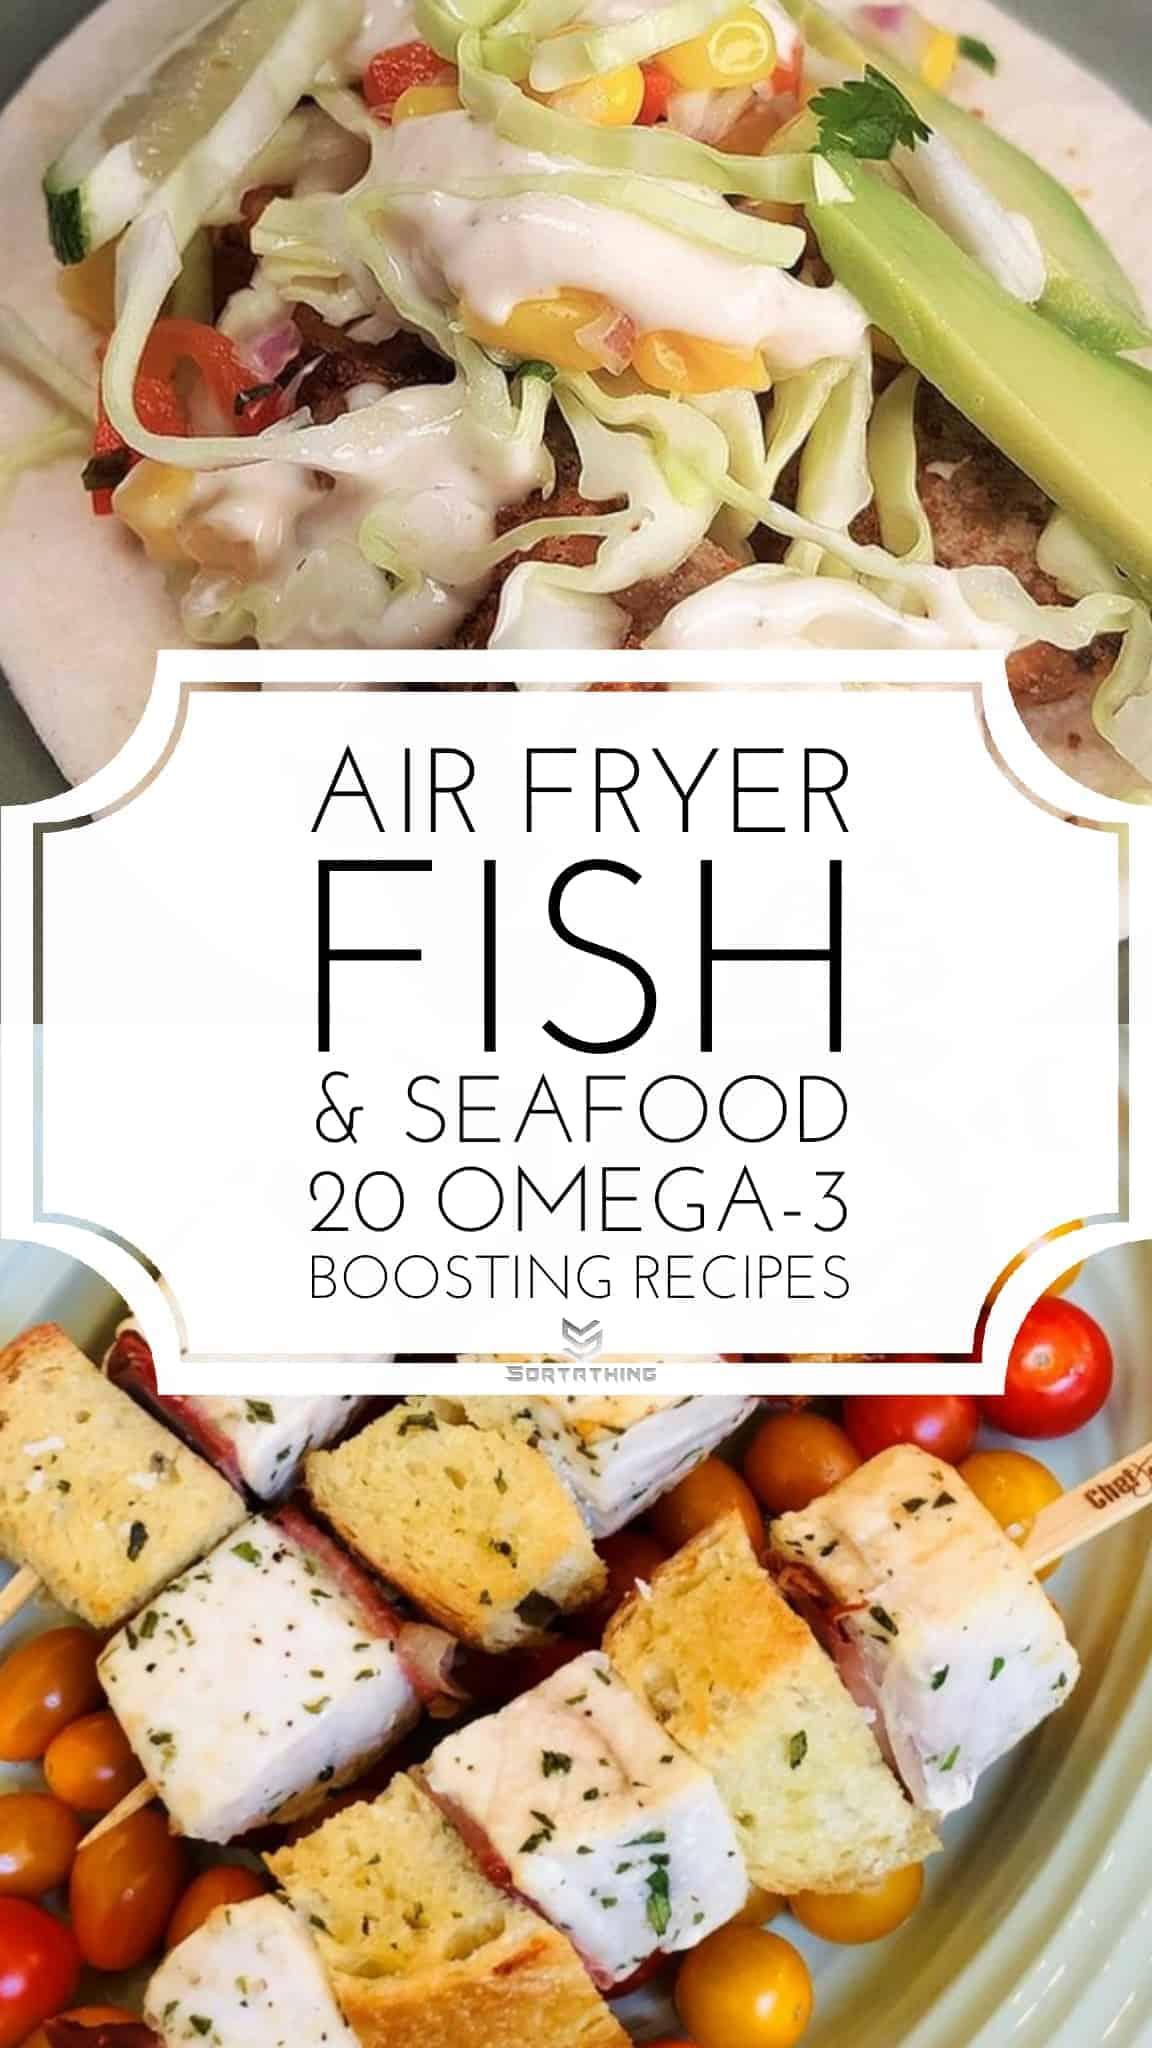 Air Fryer Baja Fish Tacos & Air Fryer Swordfish Kabobs